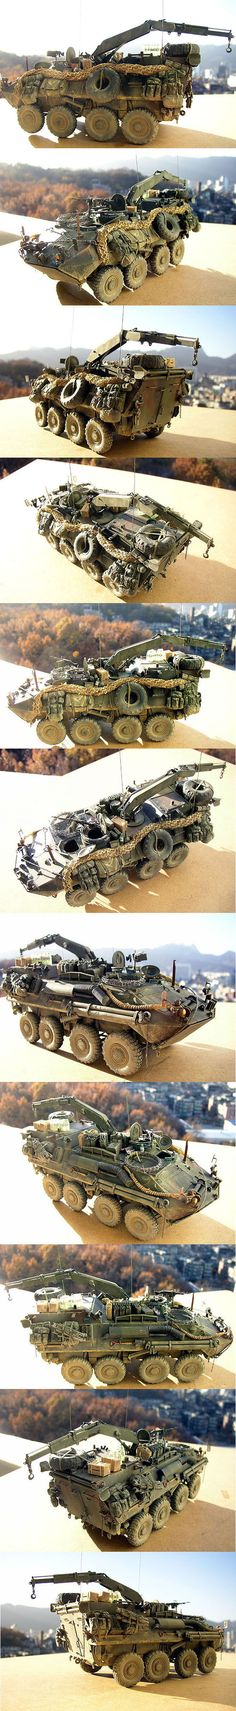 LAV-R 1/35 scale model